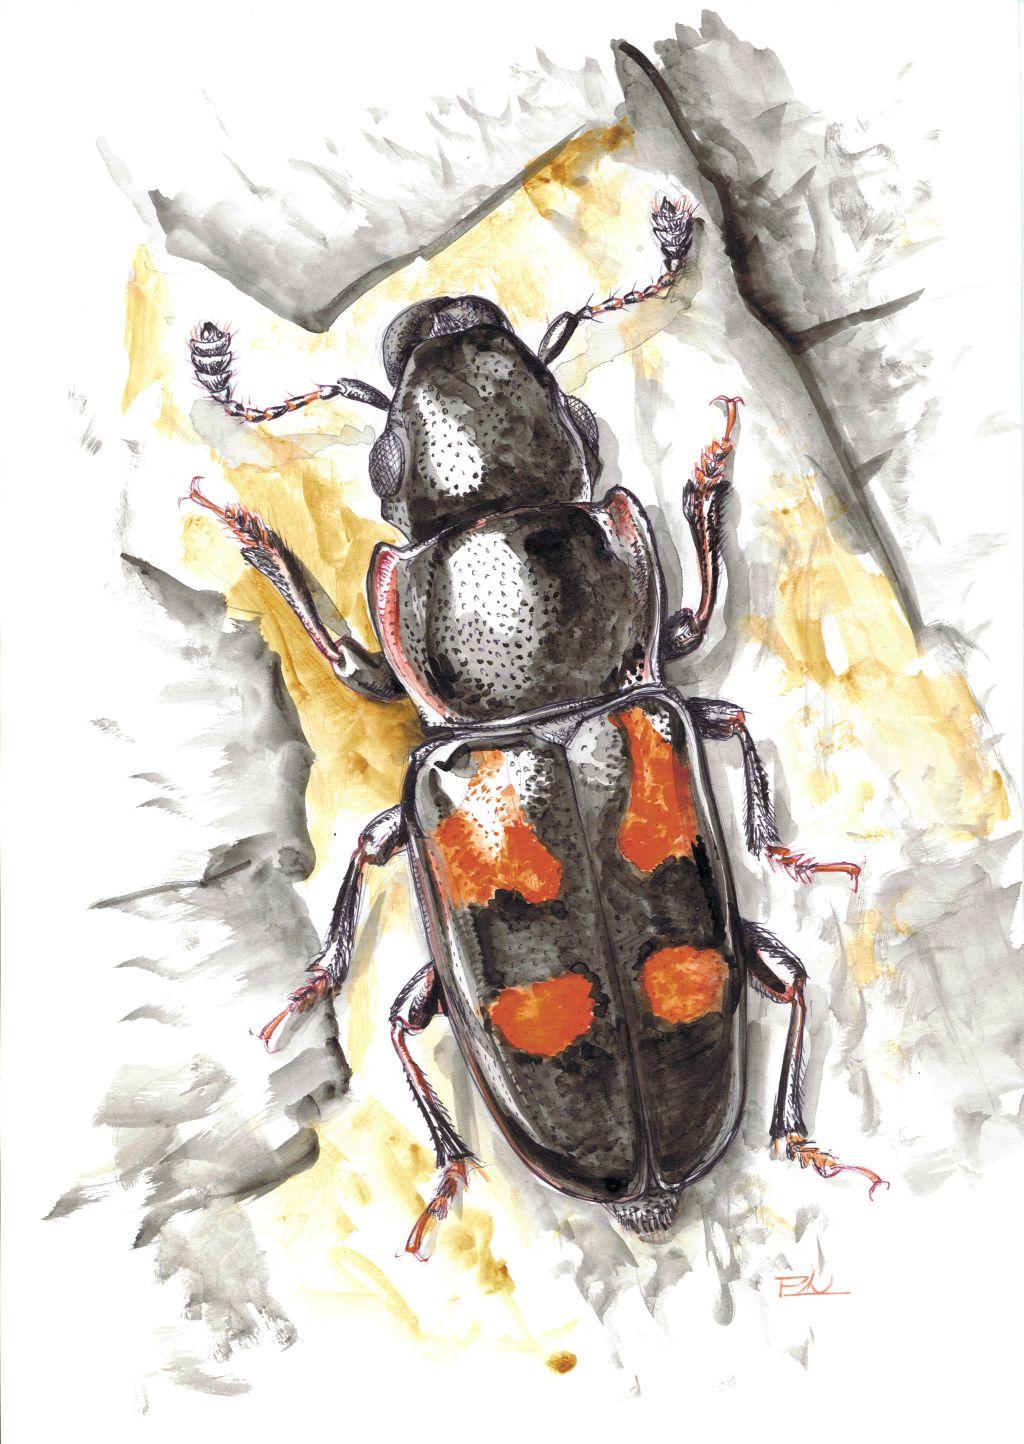 Négypontos fénybogár (Glischrochilus quadripunctatus)